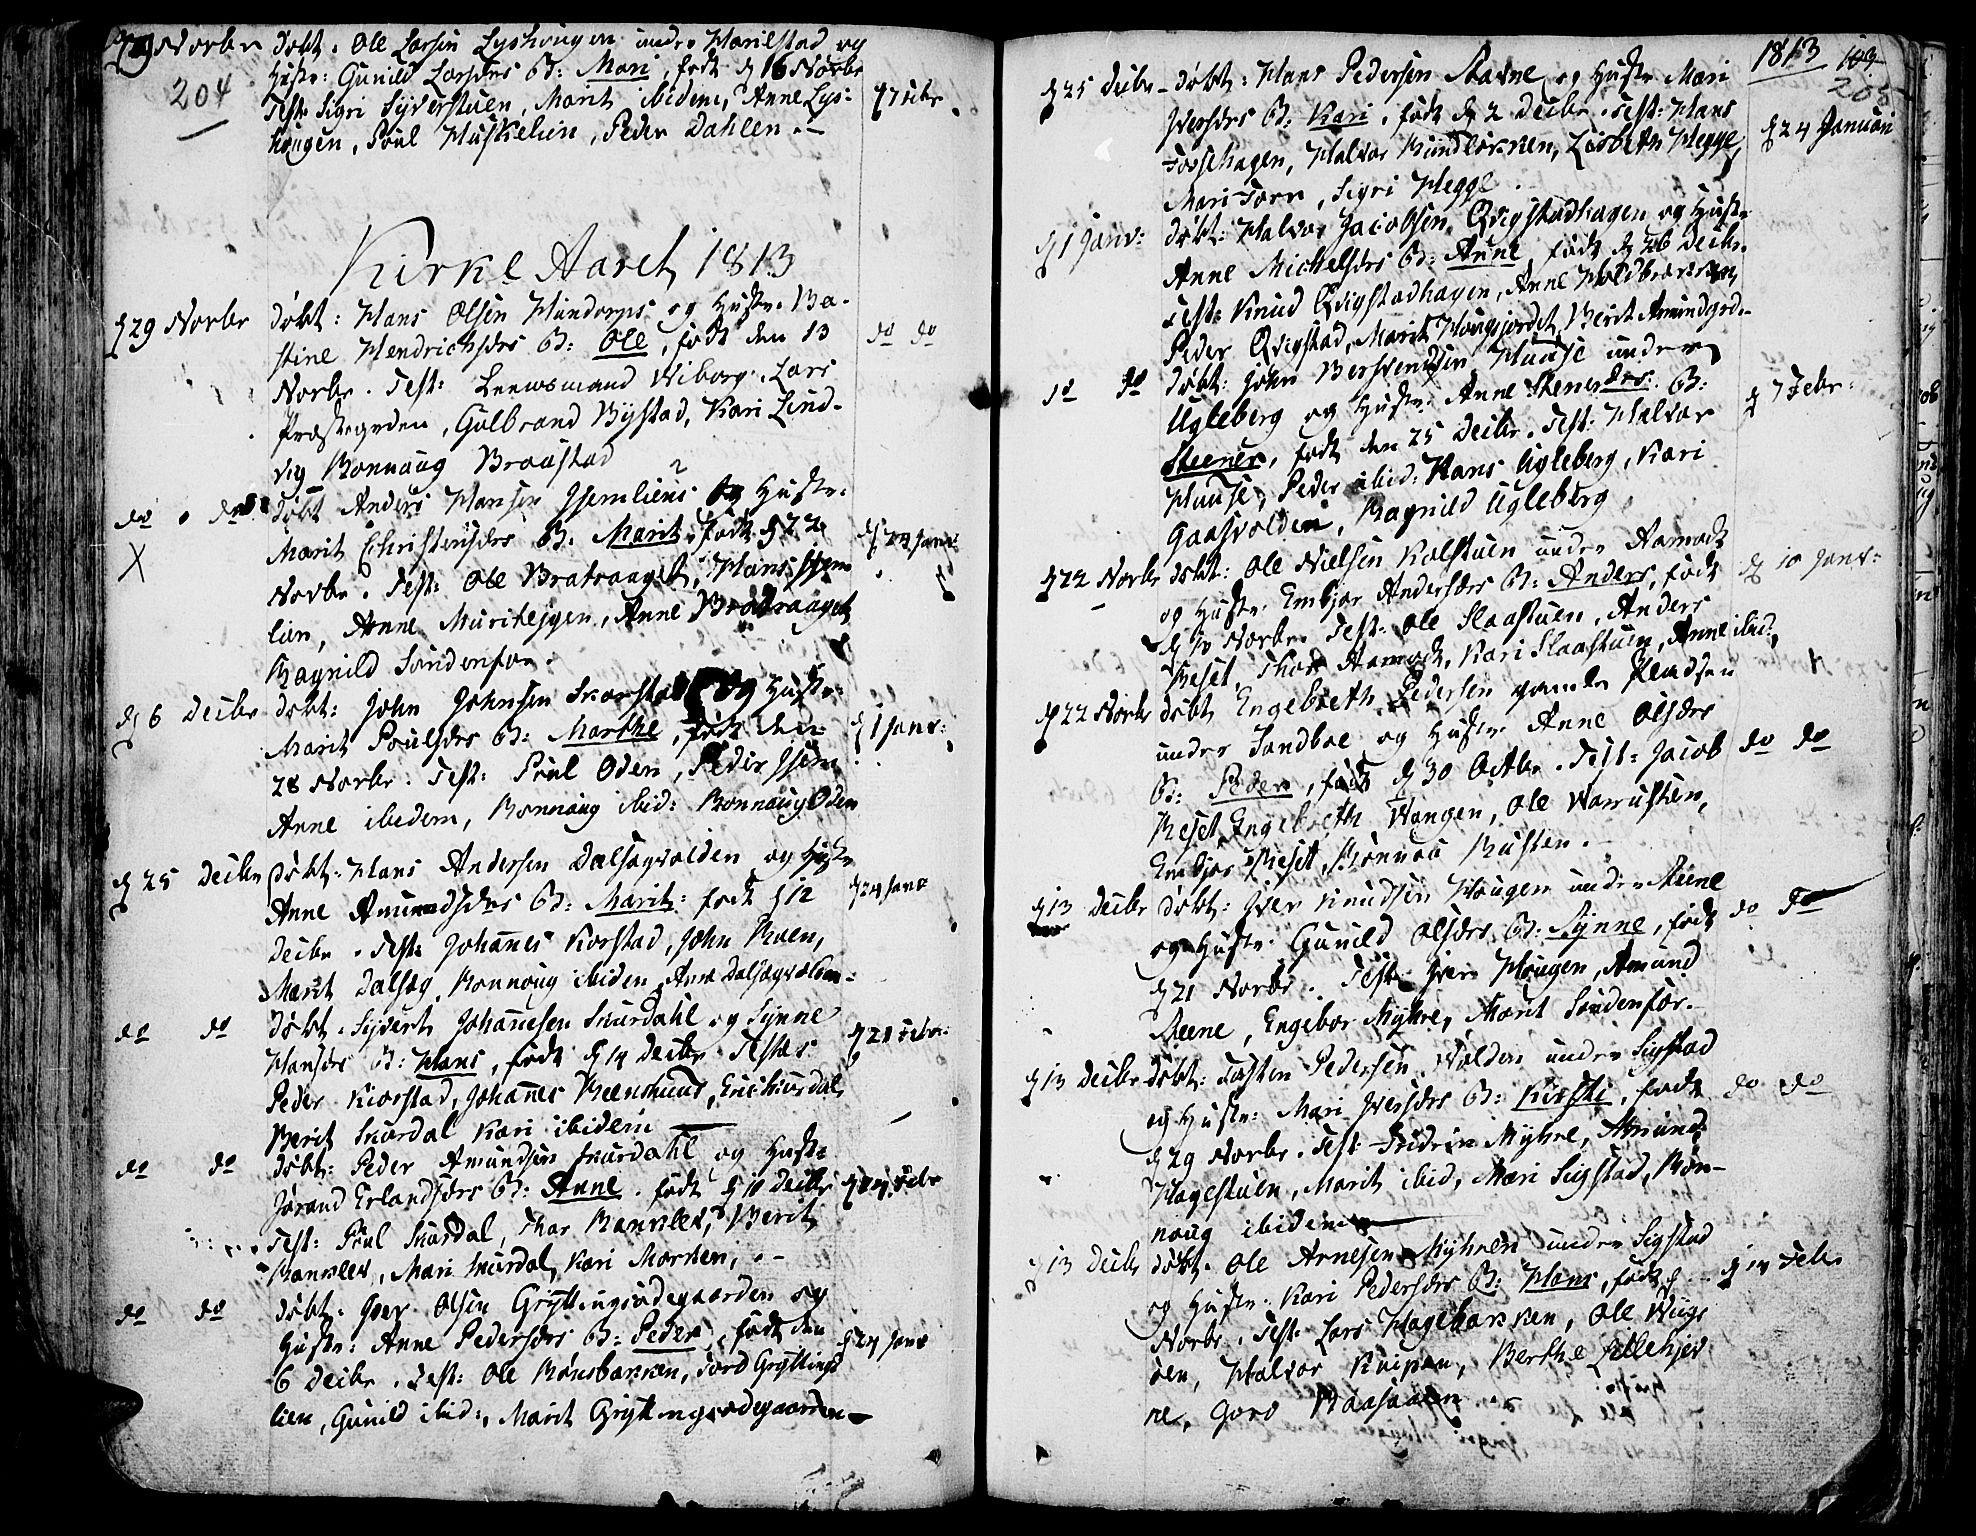 SAH, Fron prestekontor, H/Ha/Haa/L0001: Ministerialbok nr. 1, 1799-1816, s. 204-205